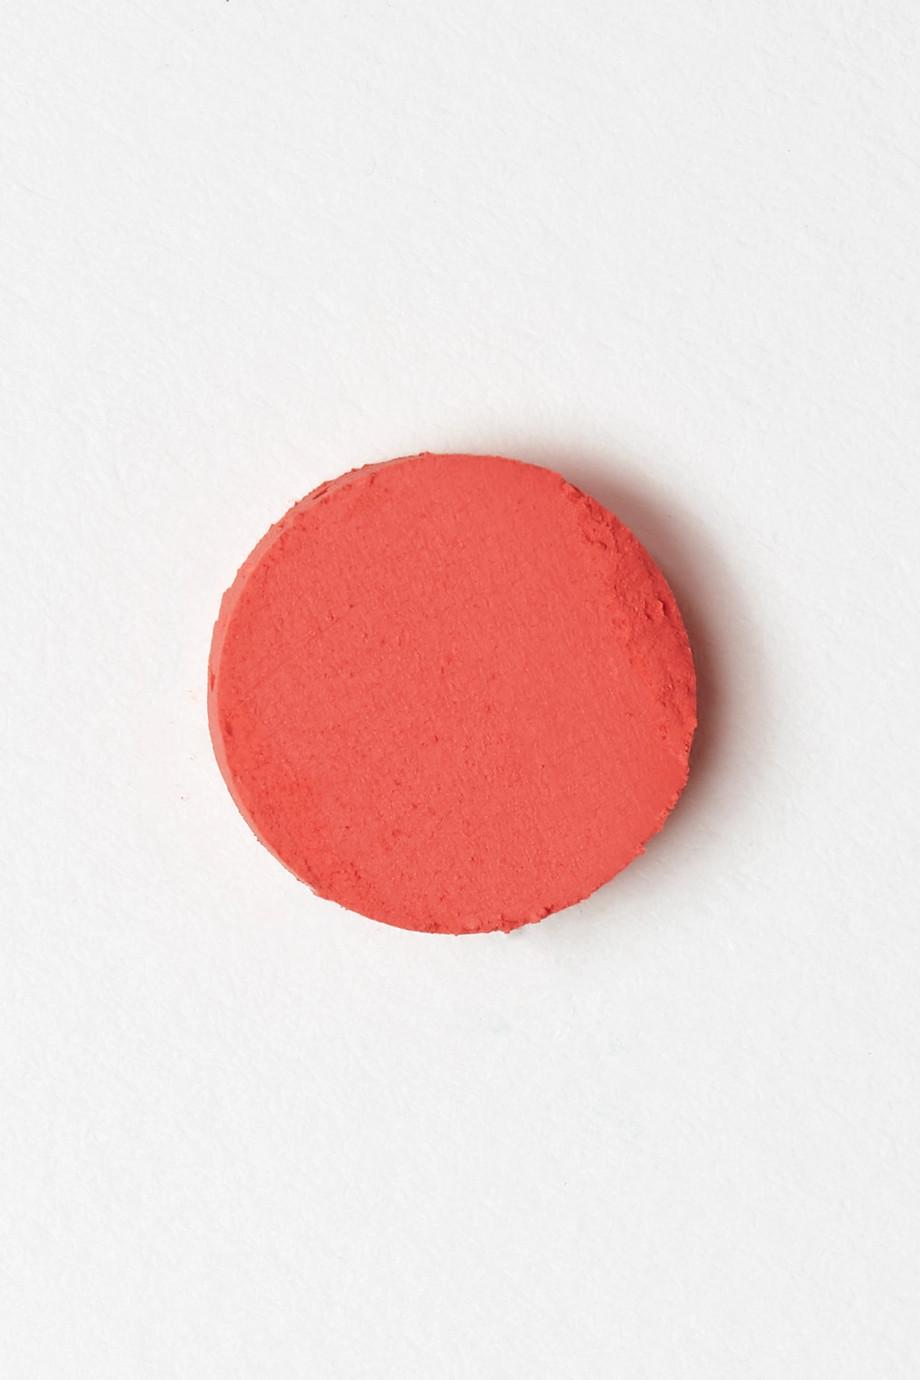 Gucci Beauty Rouge à Lèvres Mat Lipstick - Queen Christina 304